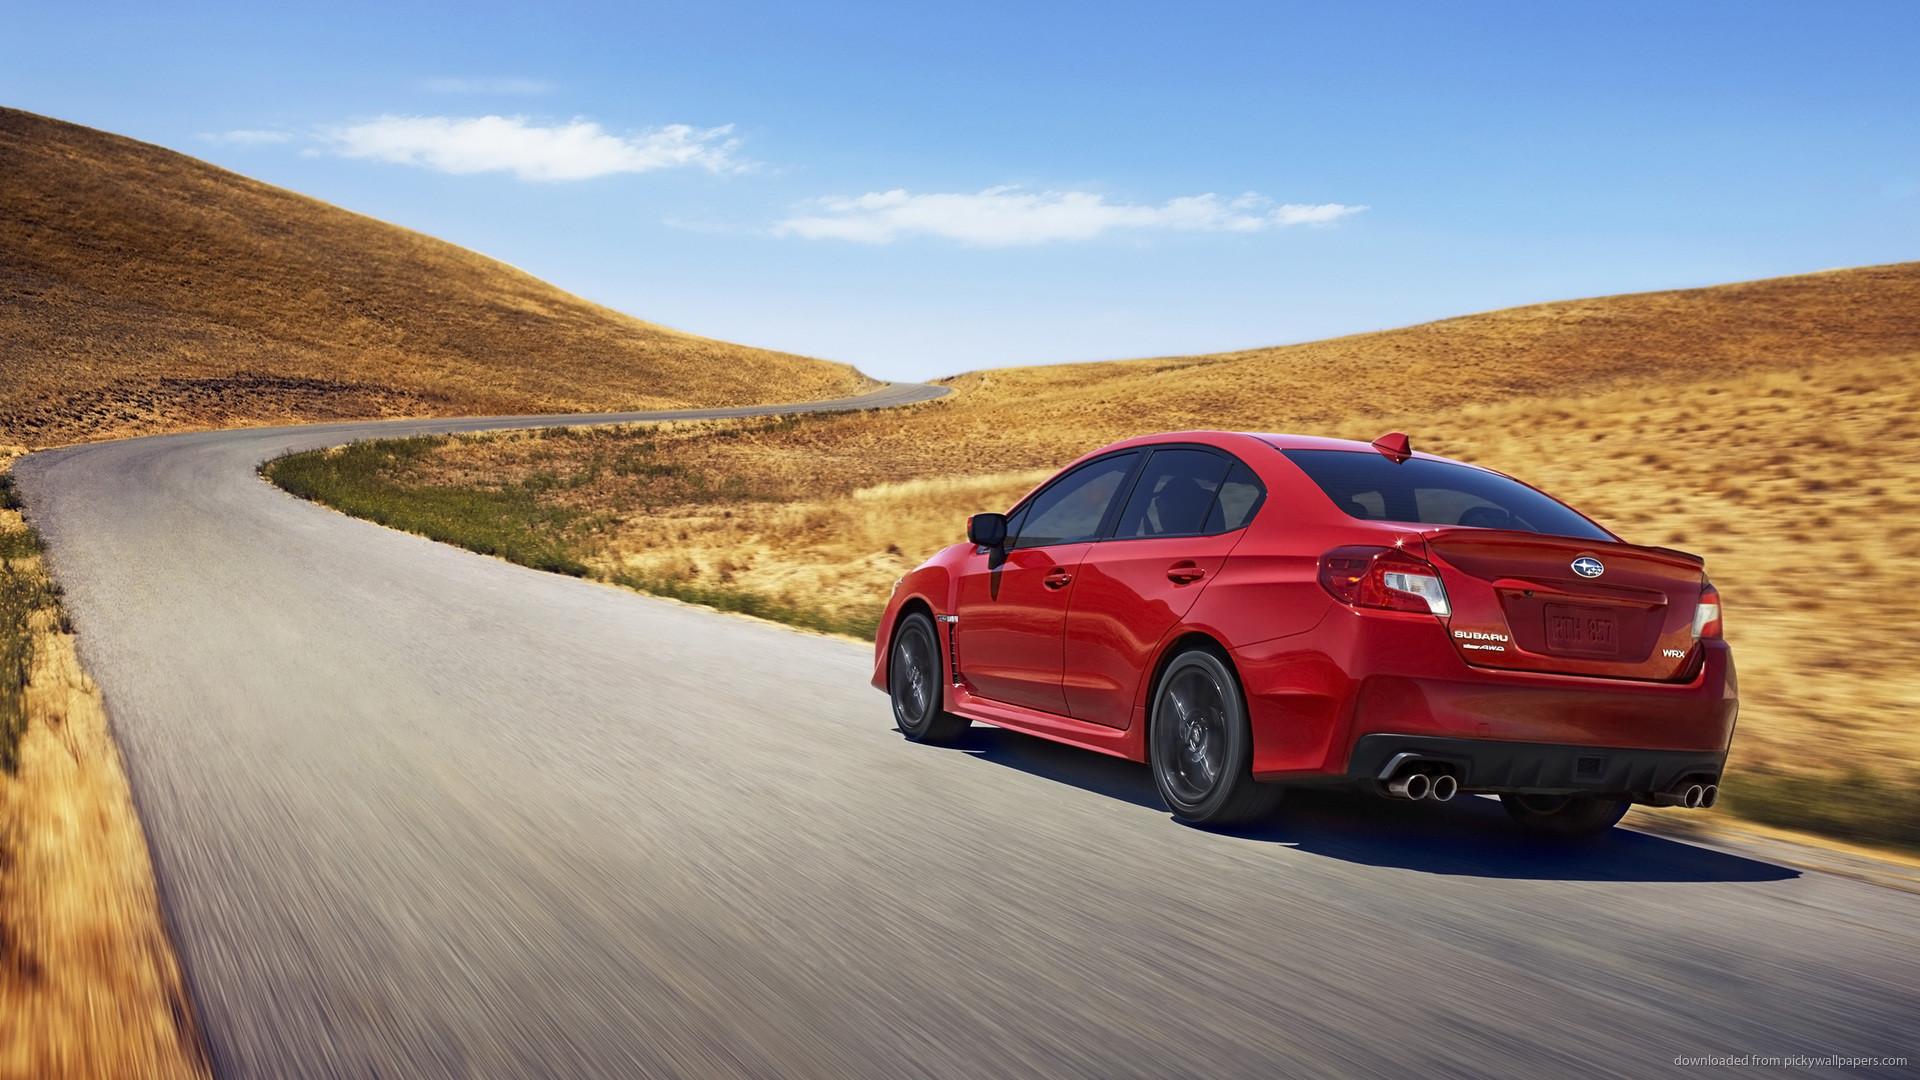 2015 Red Subaru WRX STI Rolling Shot Wallpaper picture